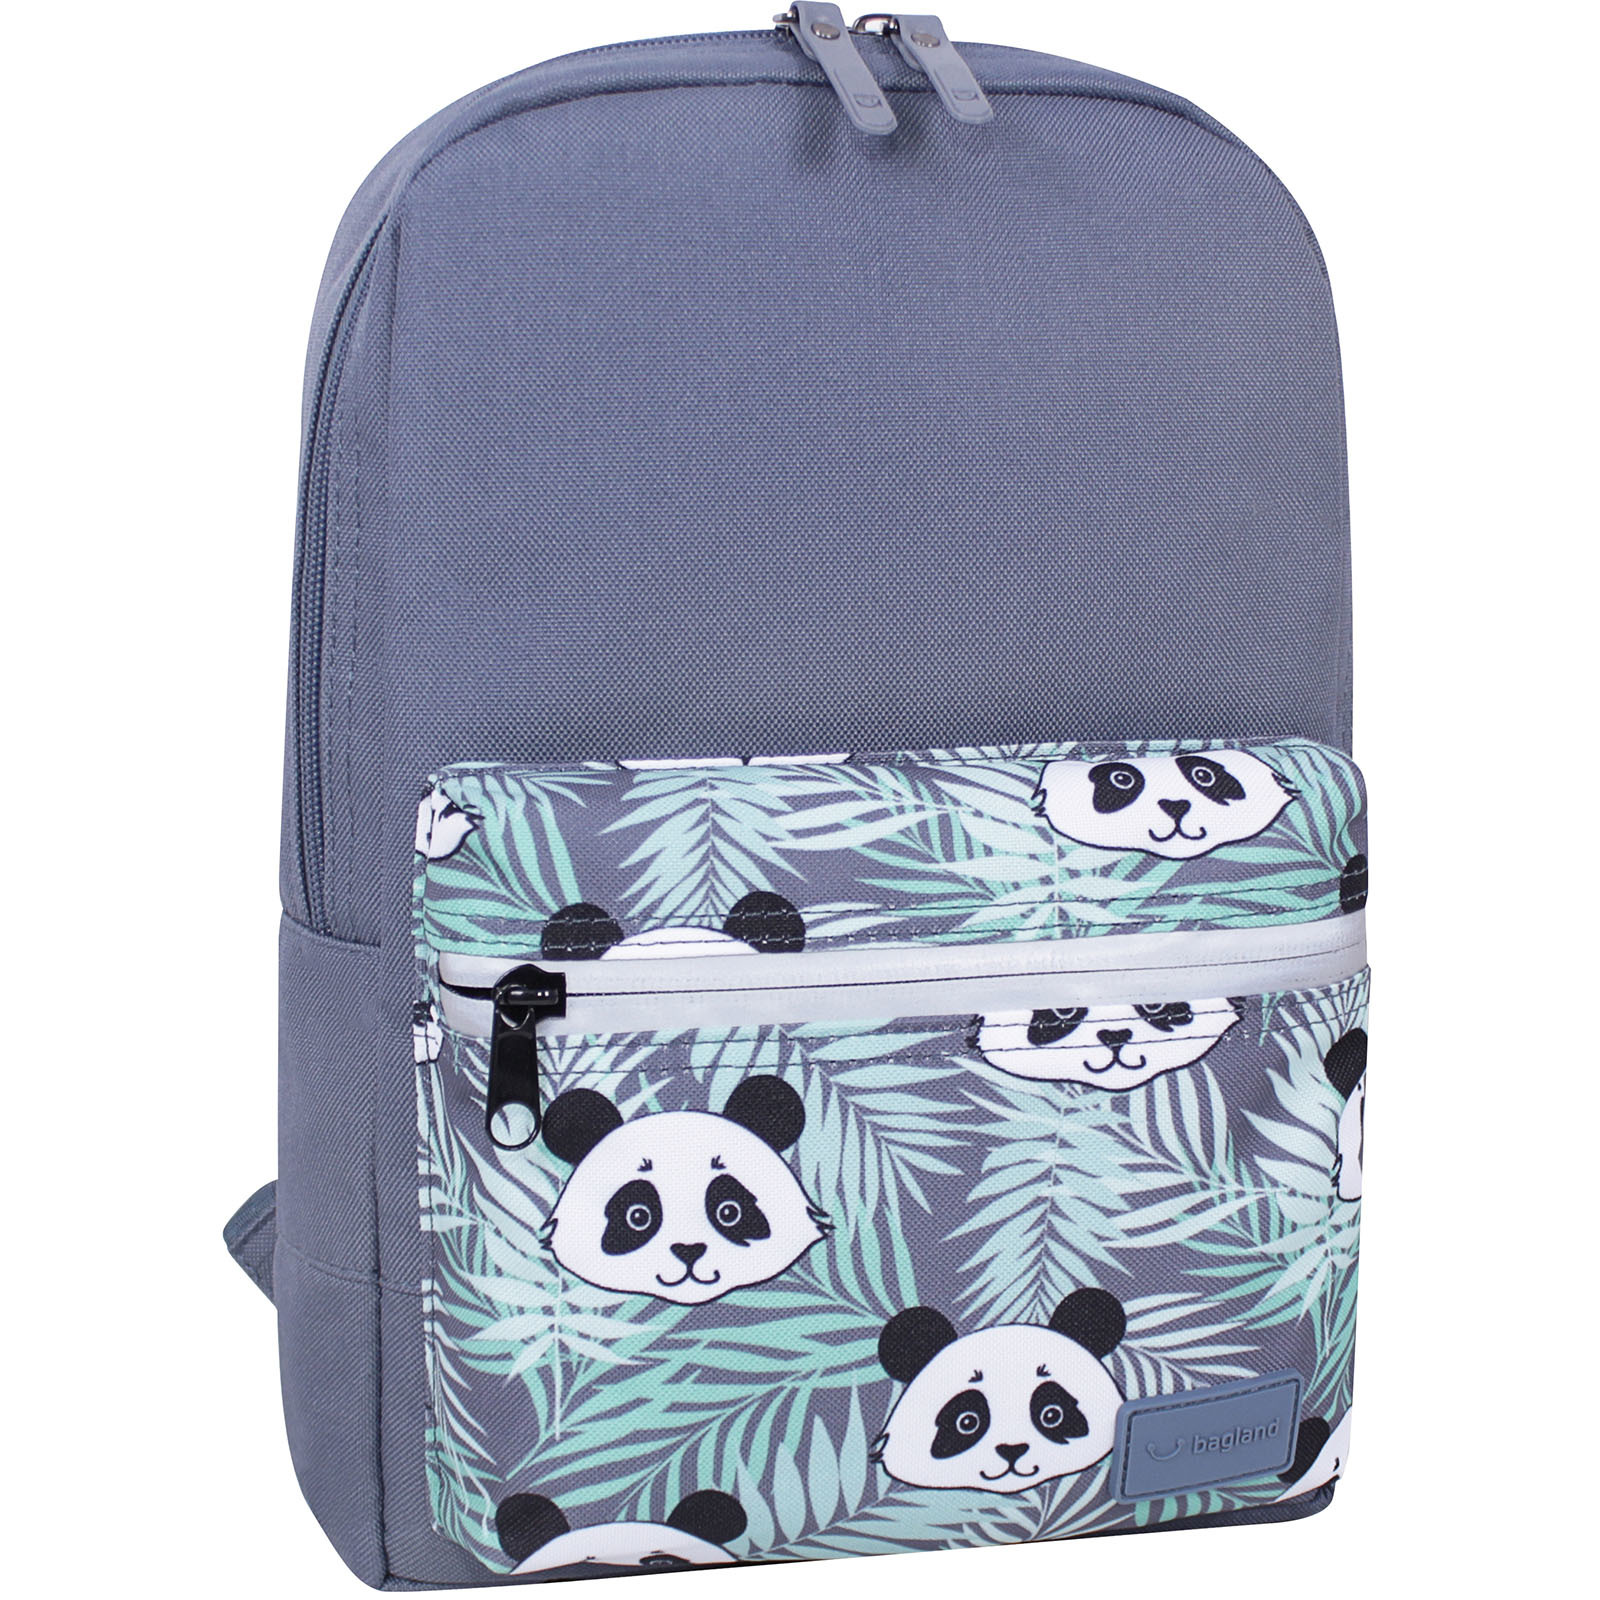 Детские рюкзаки Рюкзак Bagland Молодежный mini 8 л. серый 764 (0050866) IMG_1313суб.764.jpg